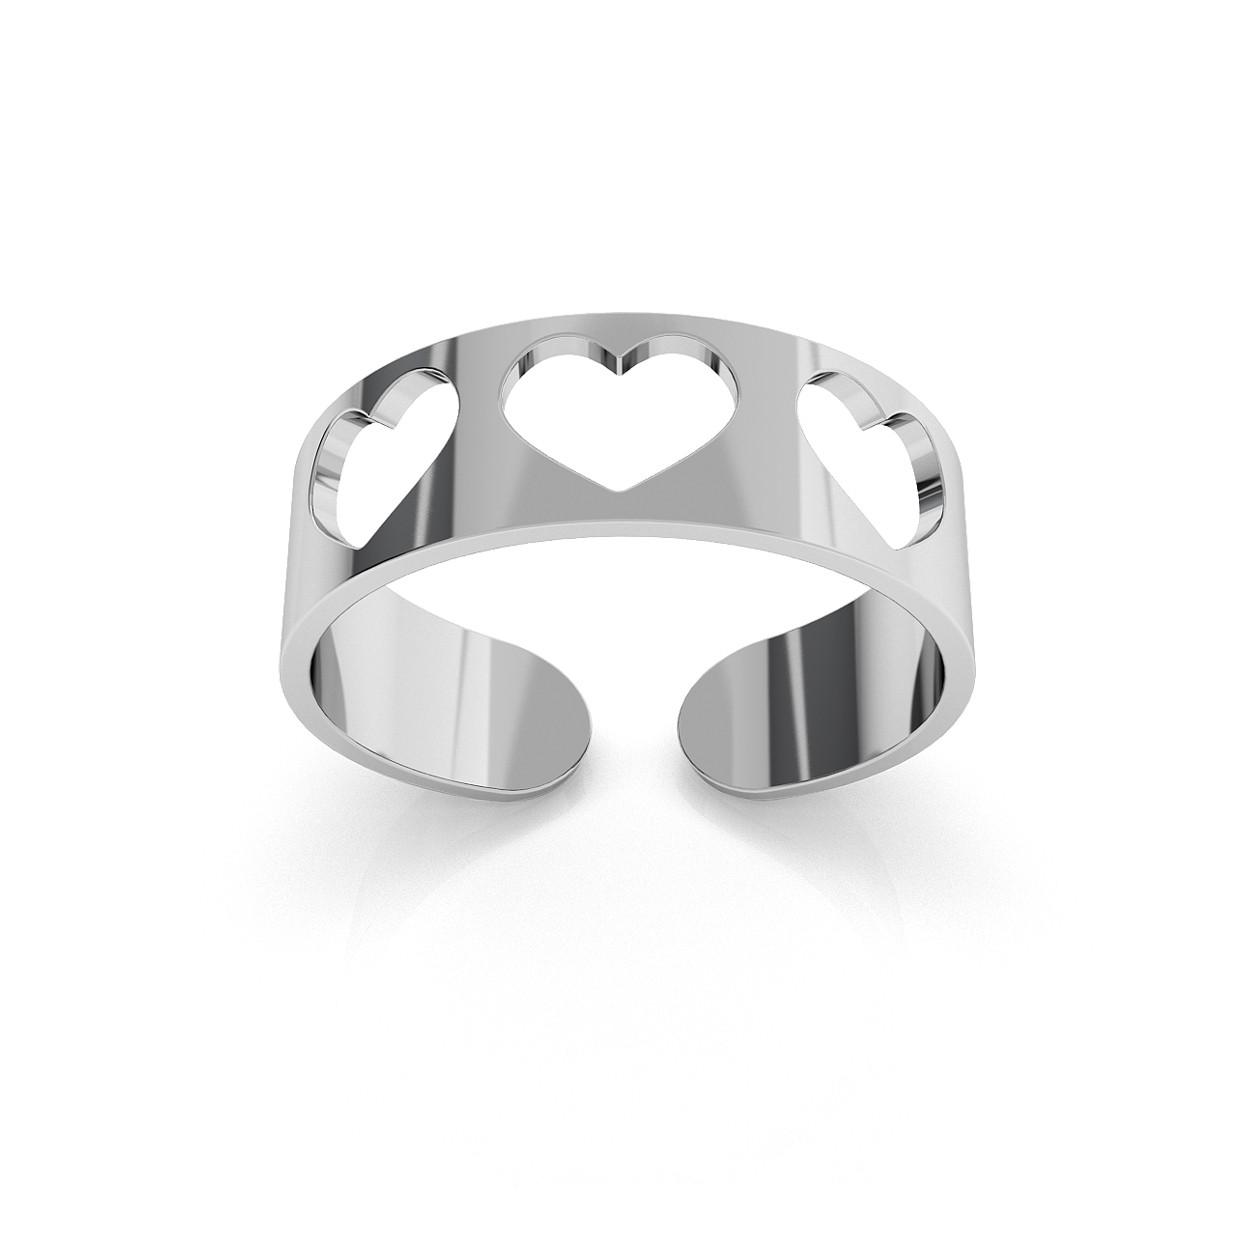 Srebrny pierścionek na kciuk 925